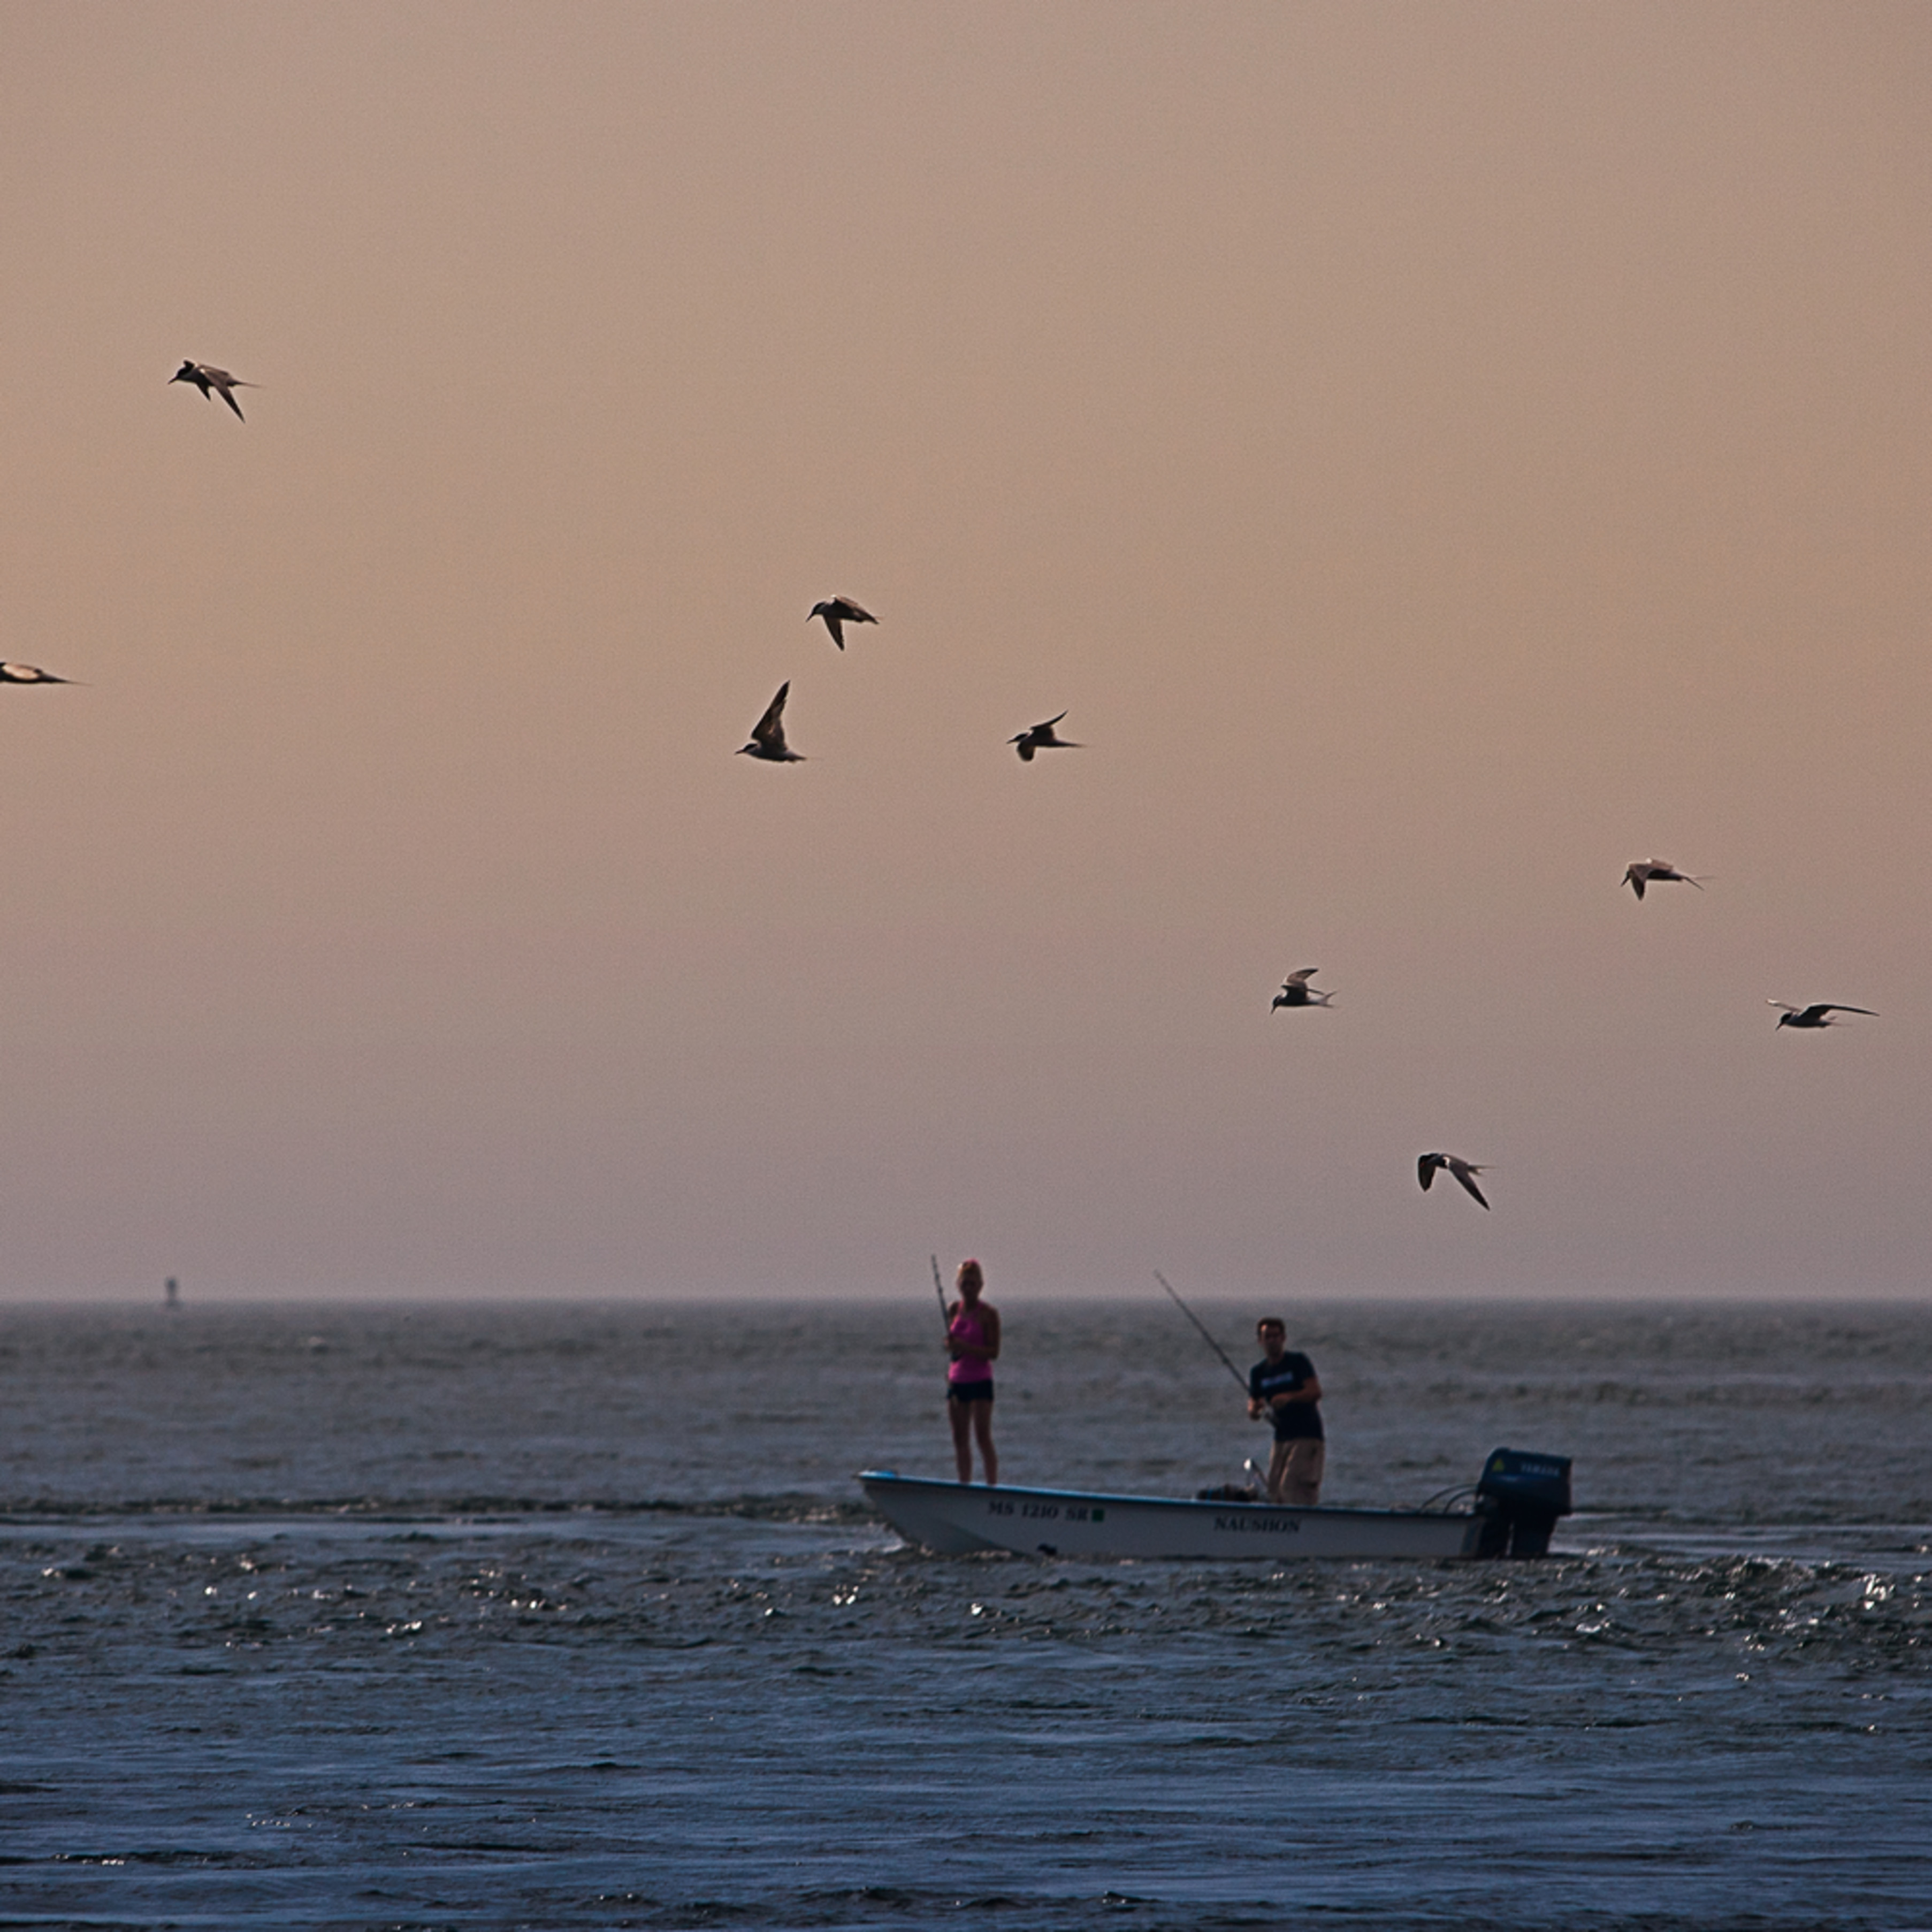 20100720 wh fishing 5145 rp2 ktidva